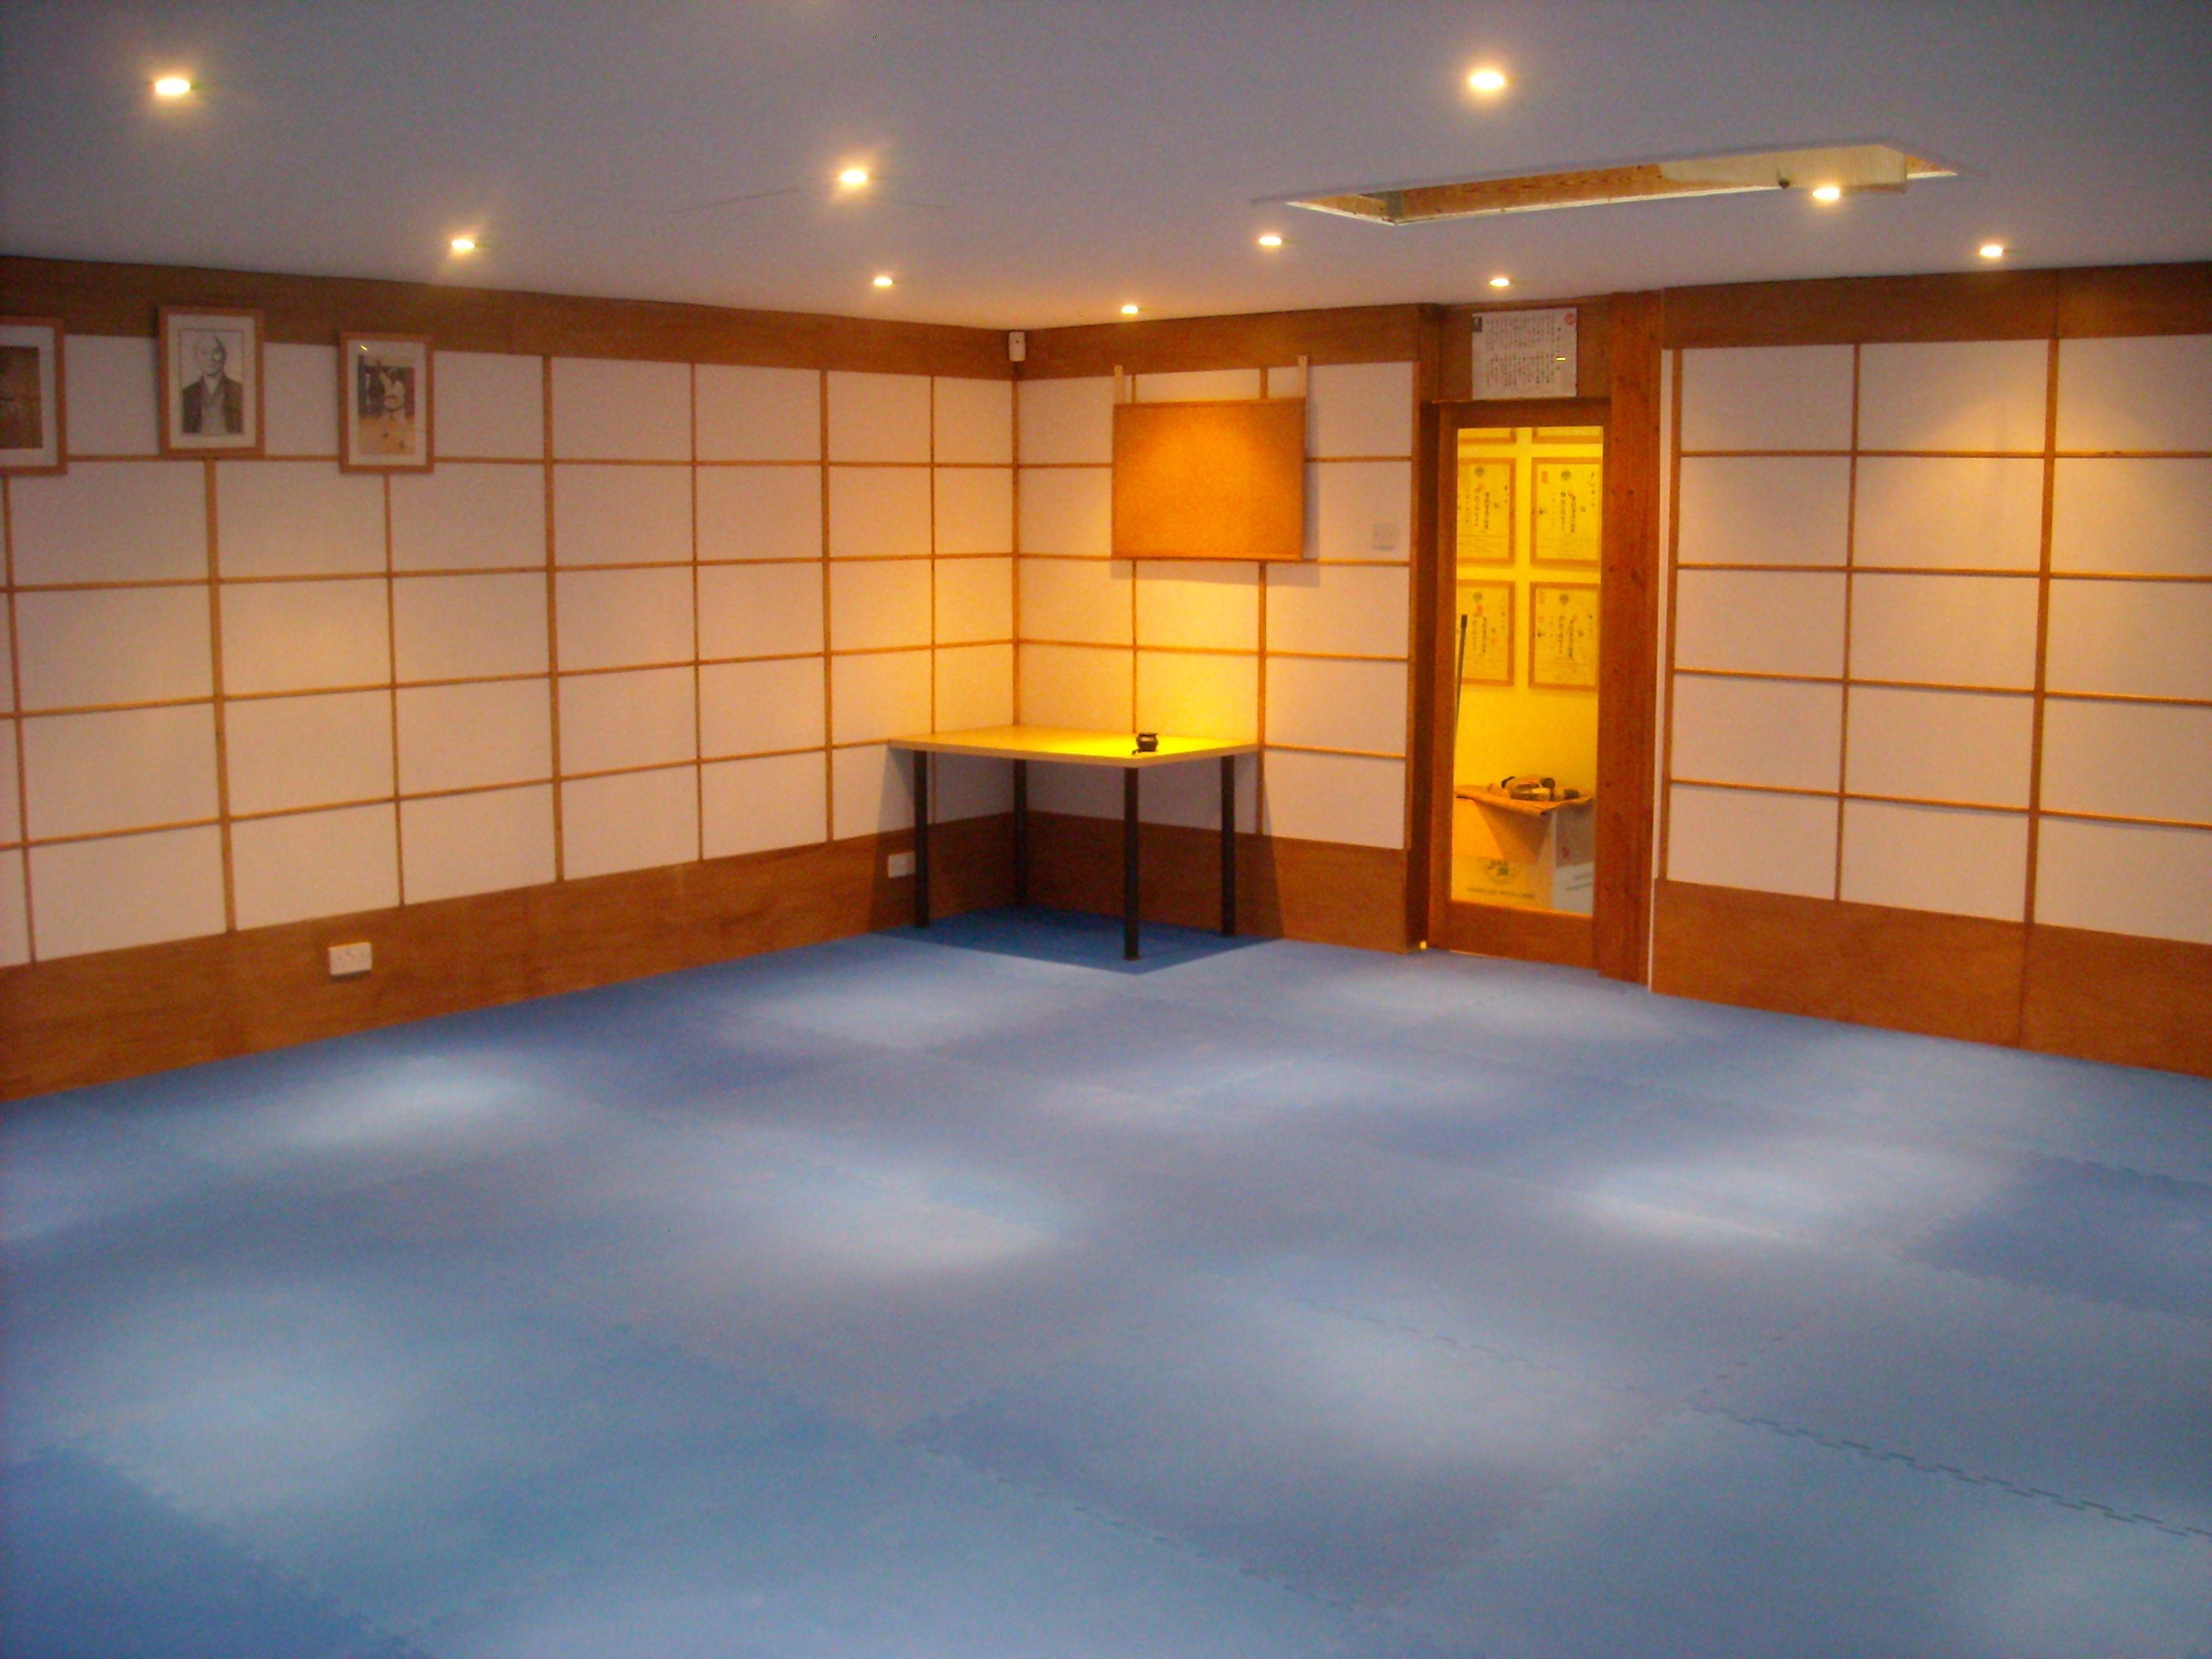 Leicester karate club uk very nice i love the lighting for Kendo dojo locator